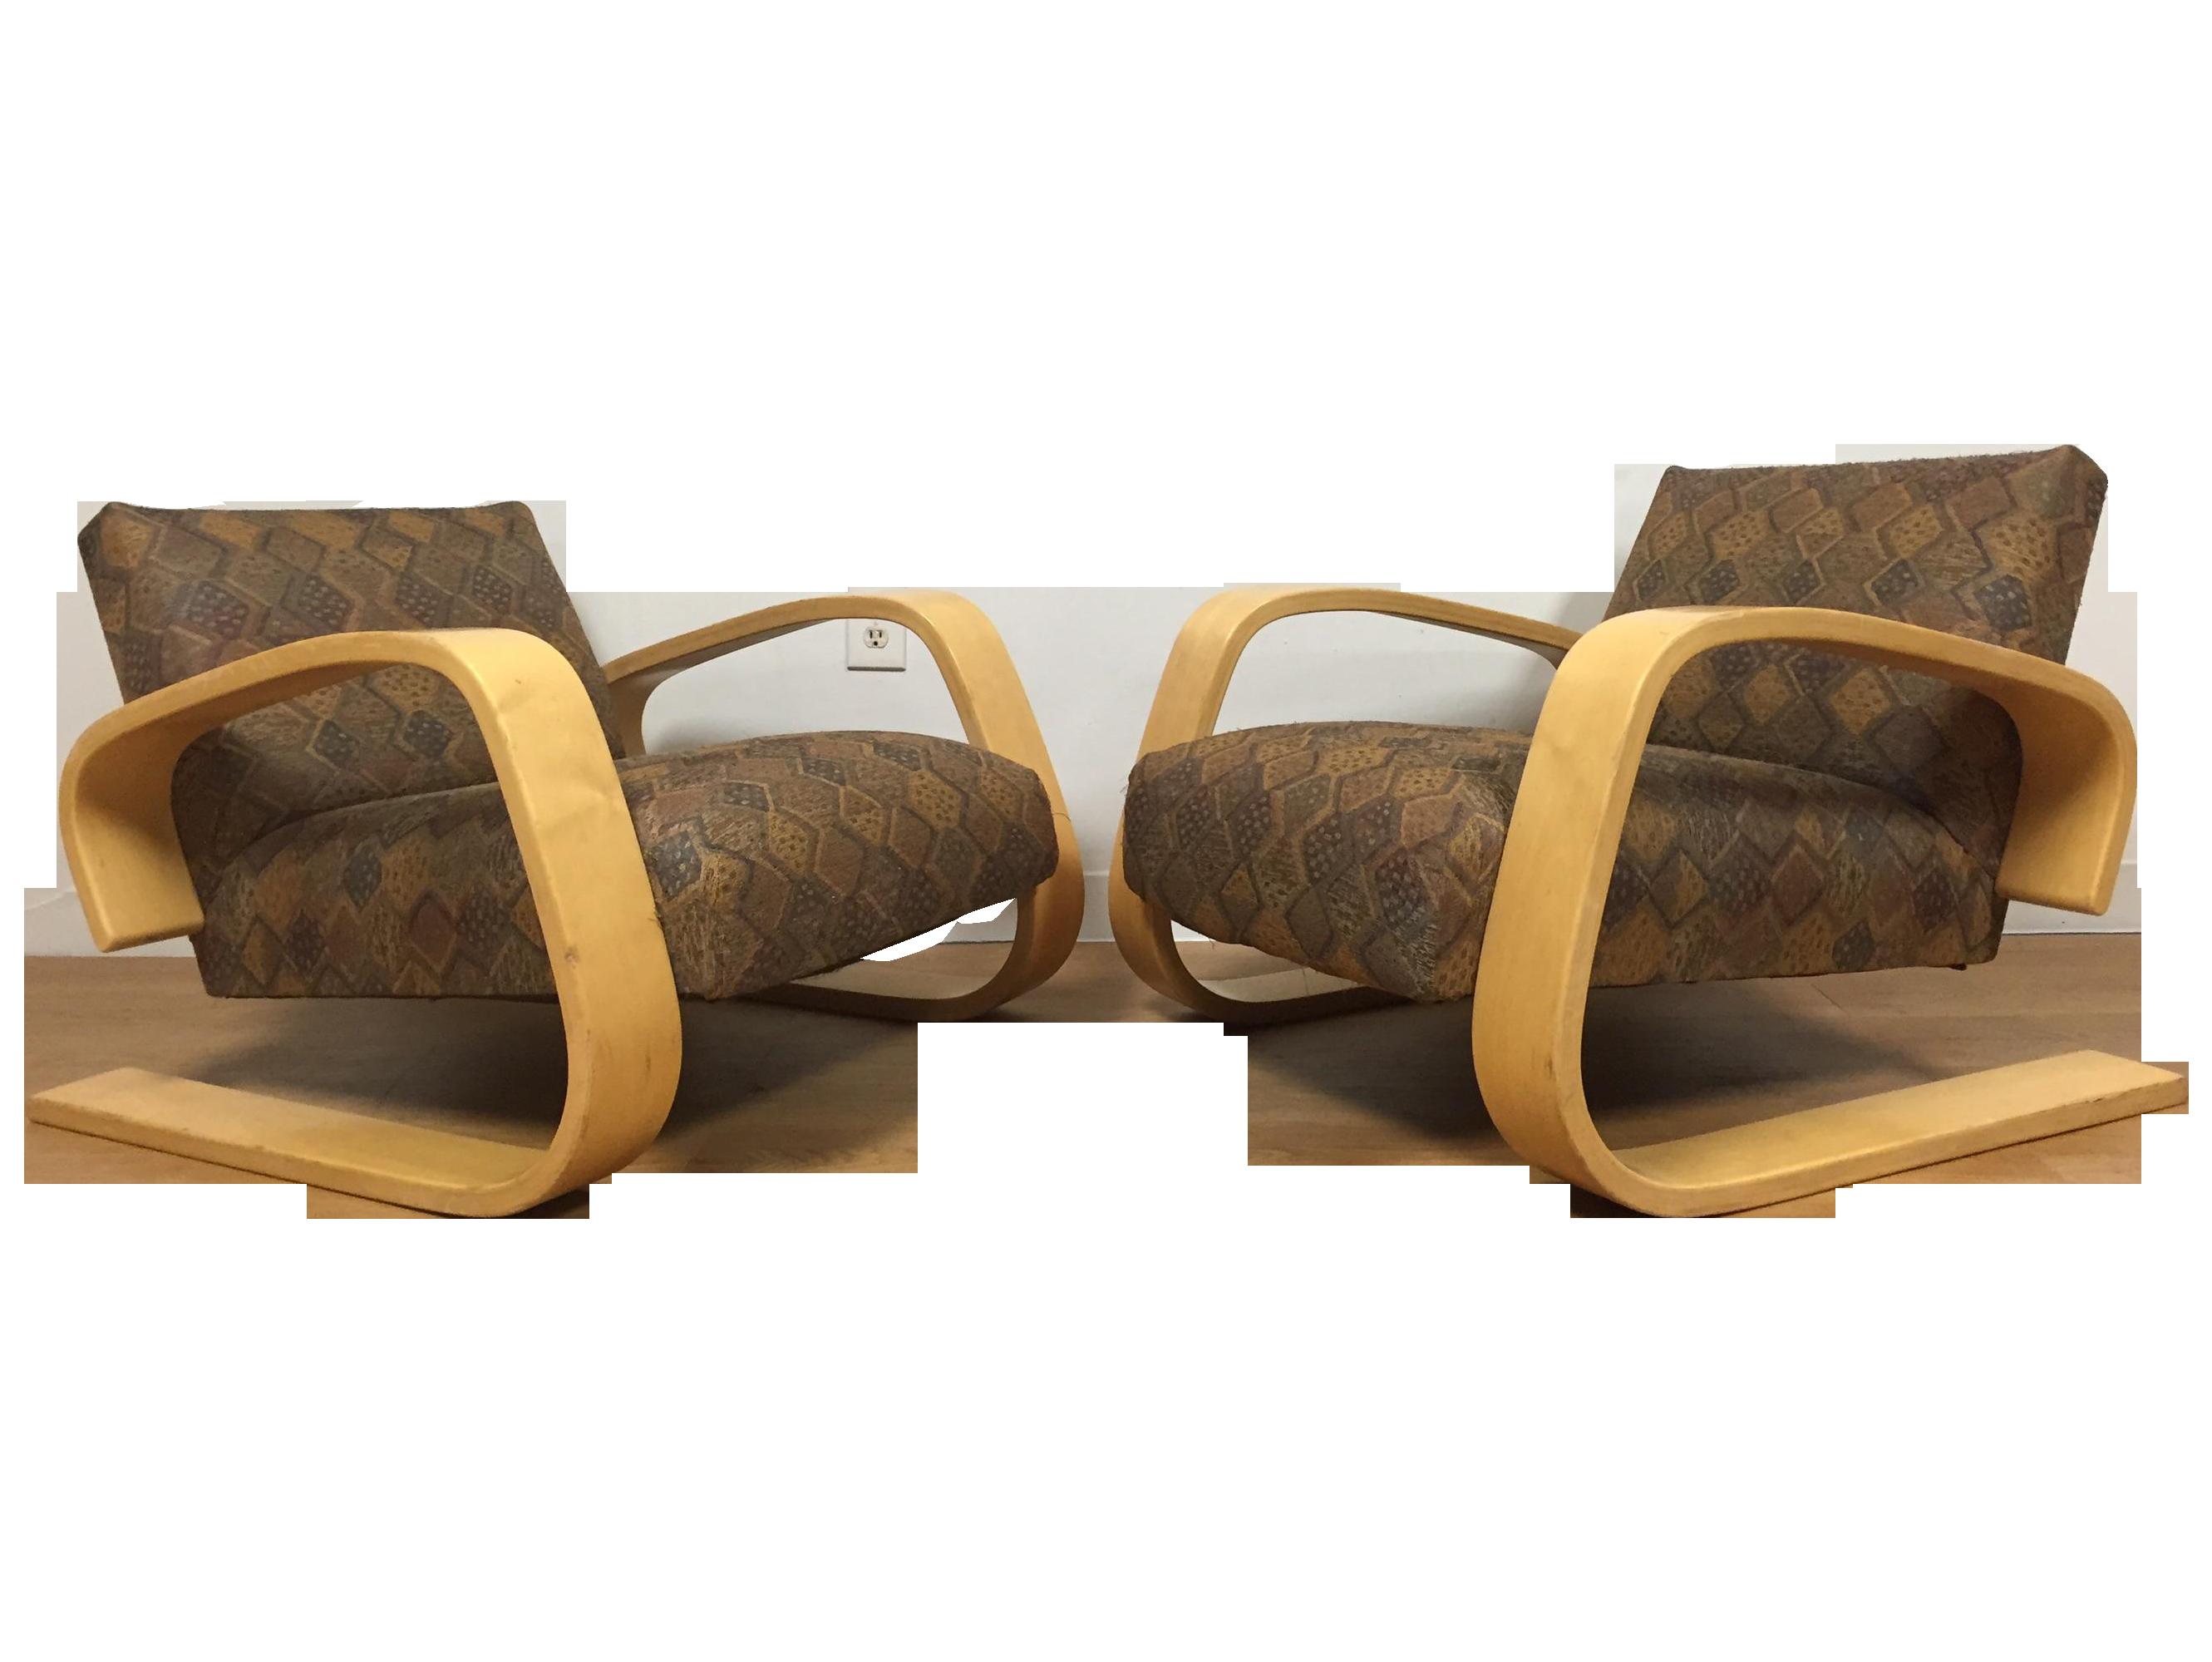 Alvar aalto for artek tank chairs a pair chairish for Chaise alvar aalto